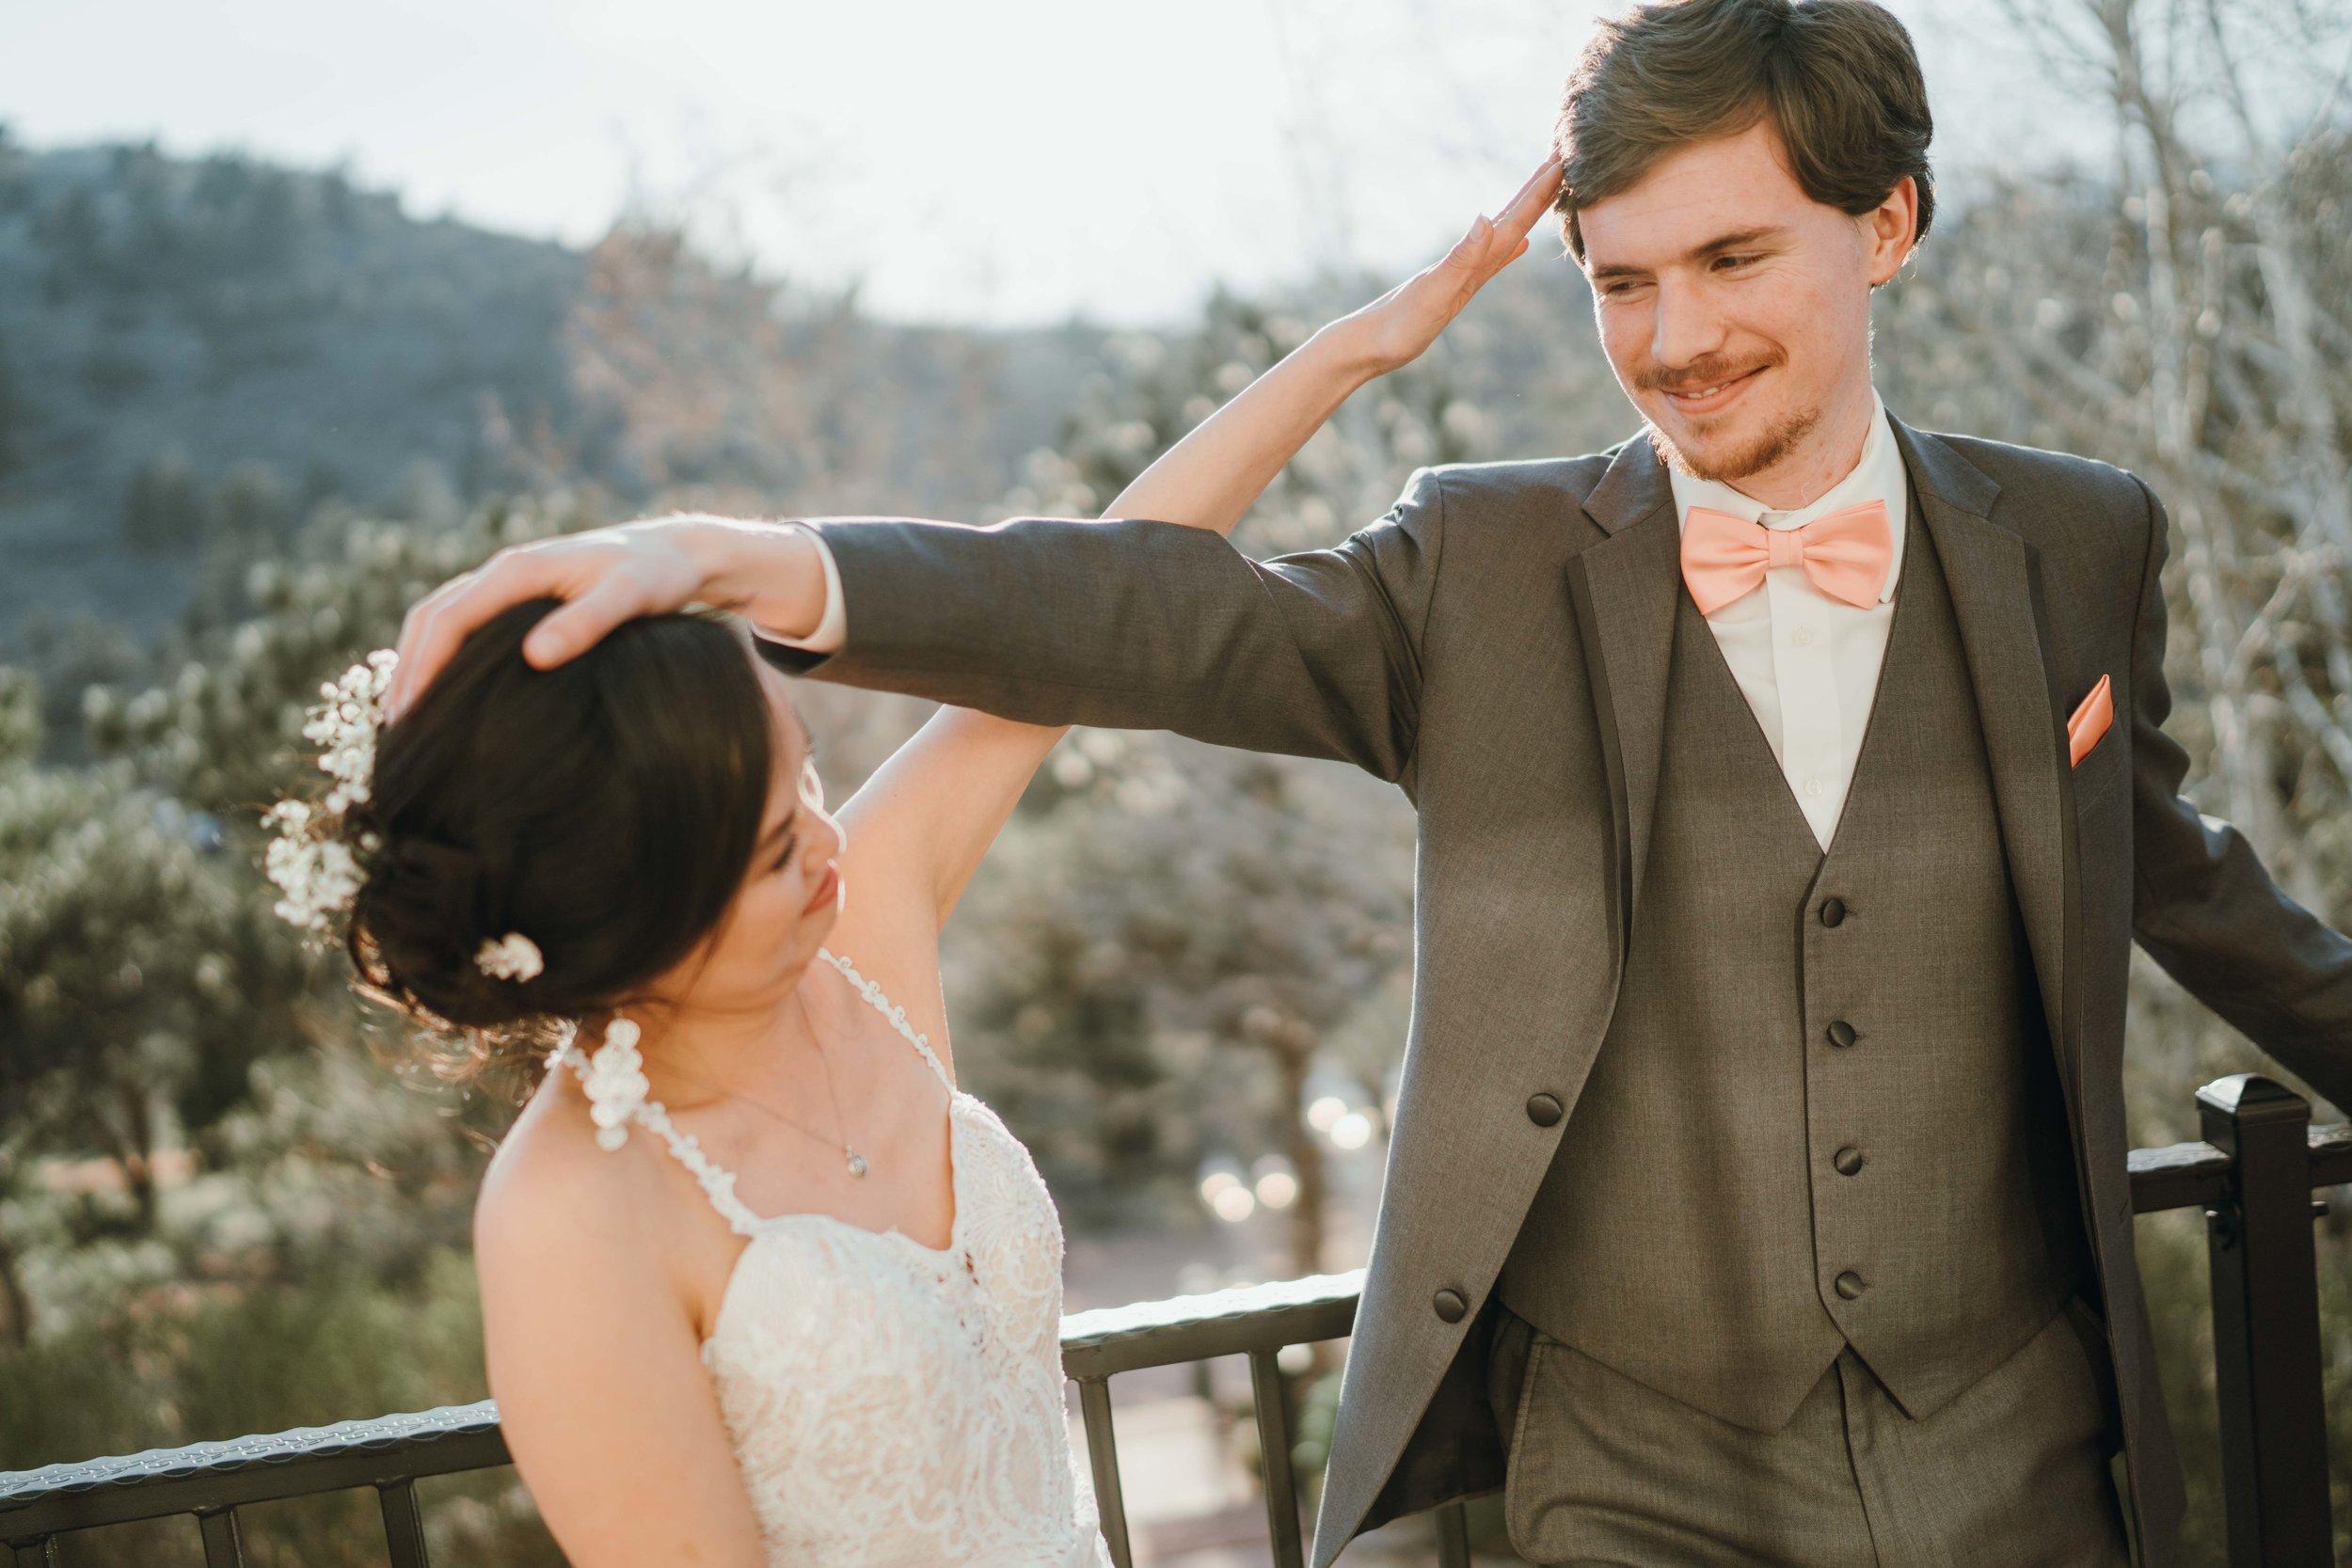 denver wedding photographer lioncrest manor in lyons ben and mali -DSC06414.jpg